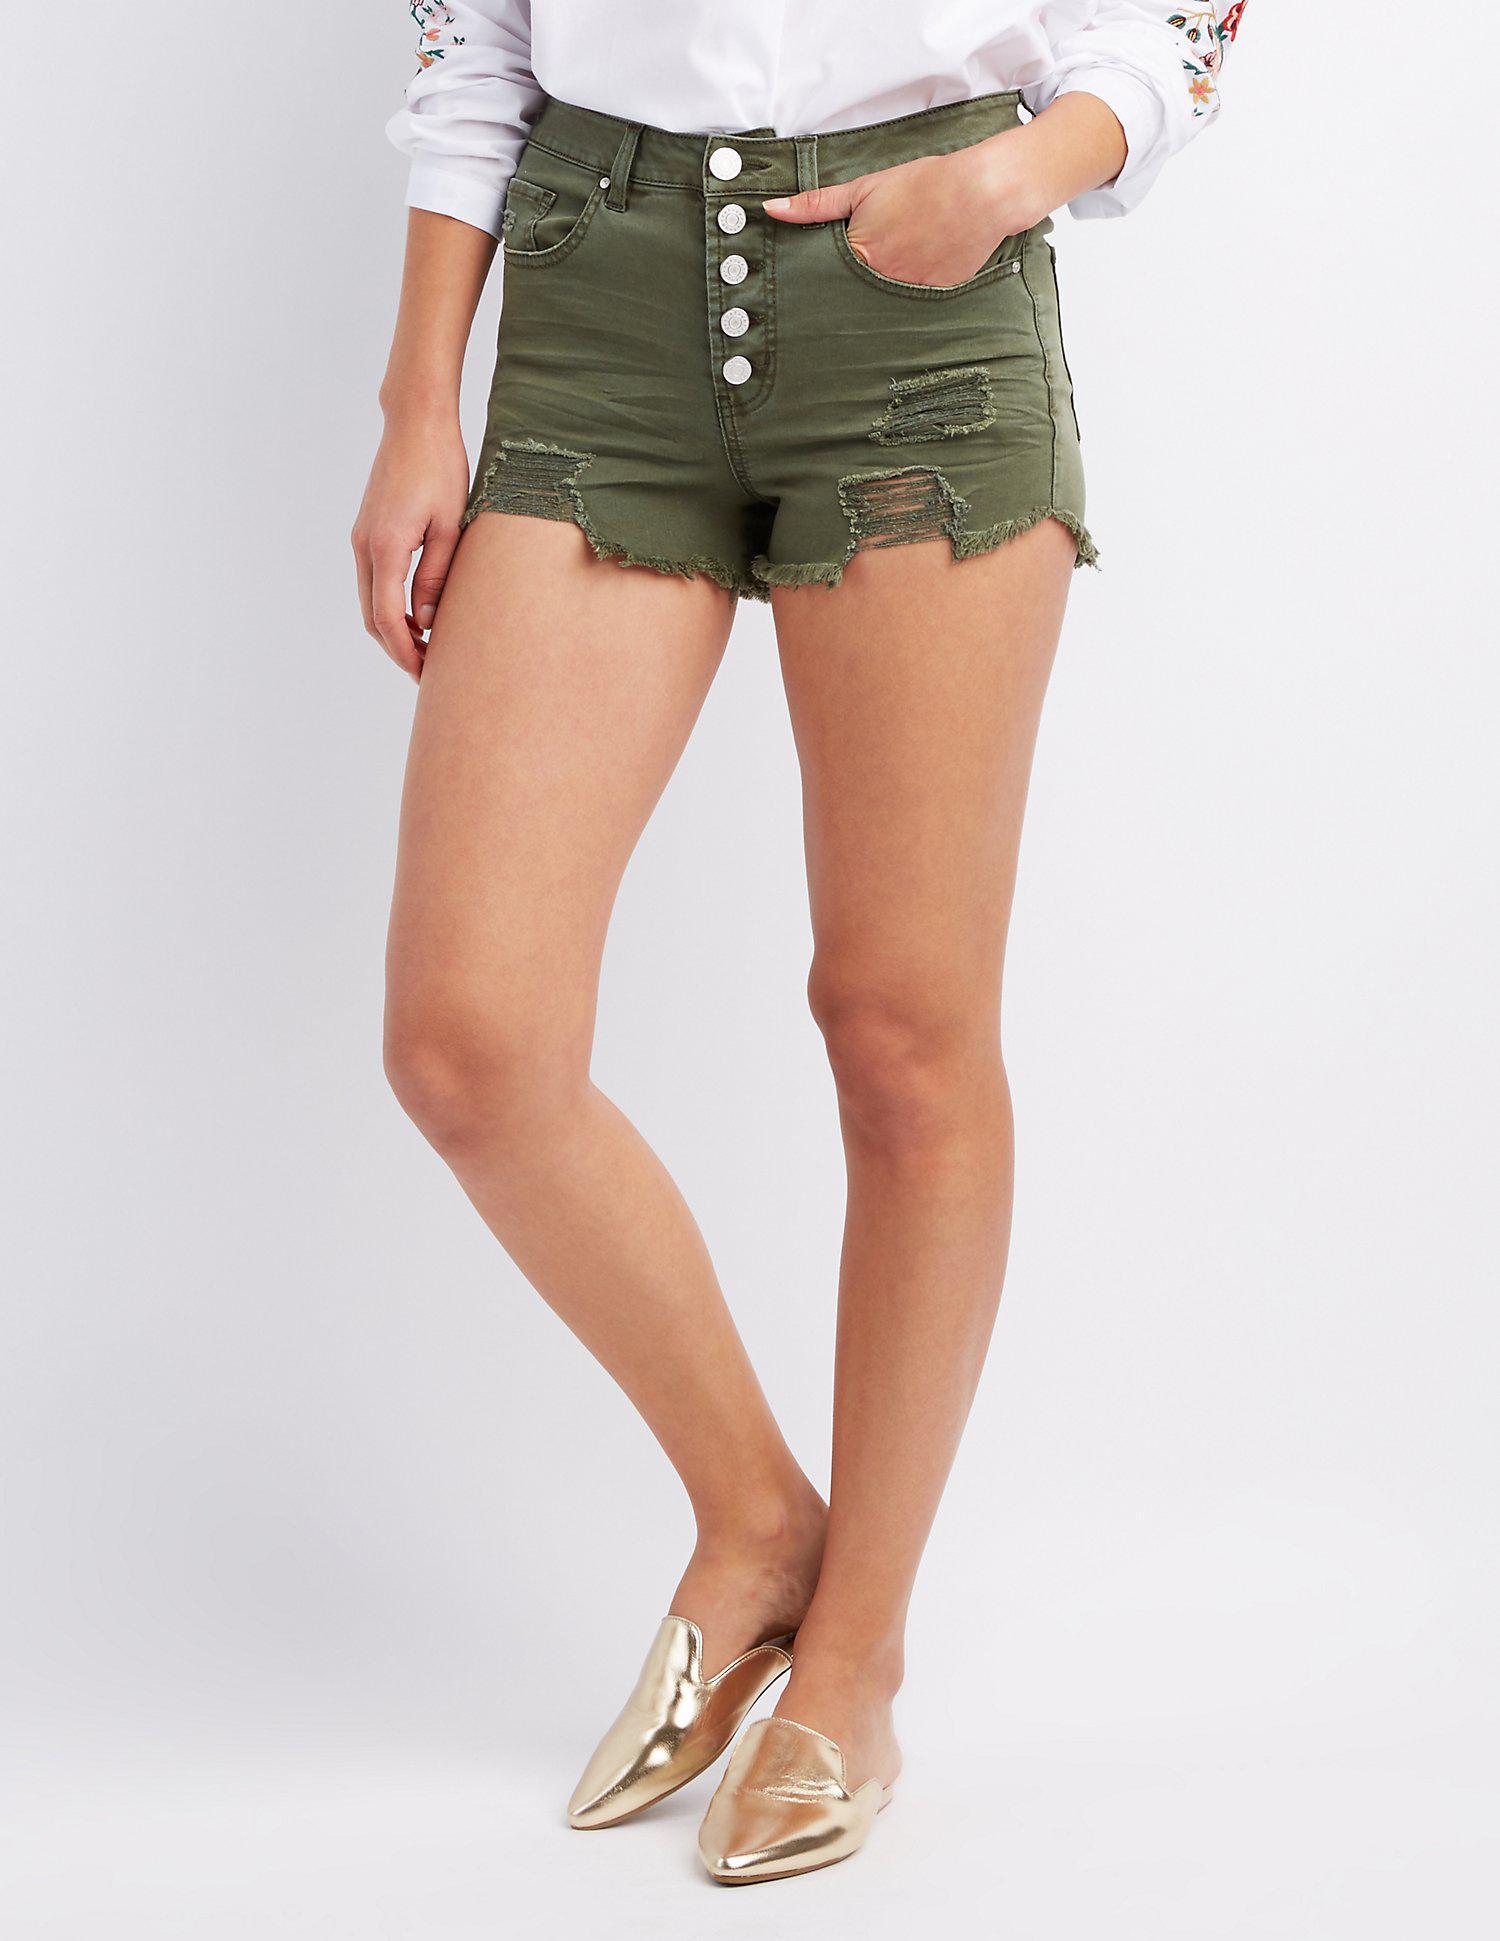 f97c75b846 Charlotte Russe. Women's Green Refuge Destroyed Hi-rise Cheeky Denim Shorts